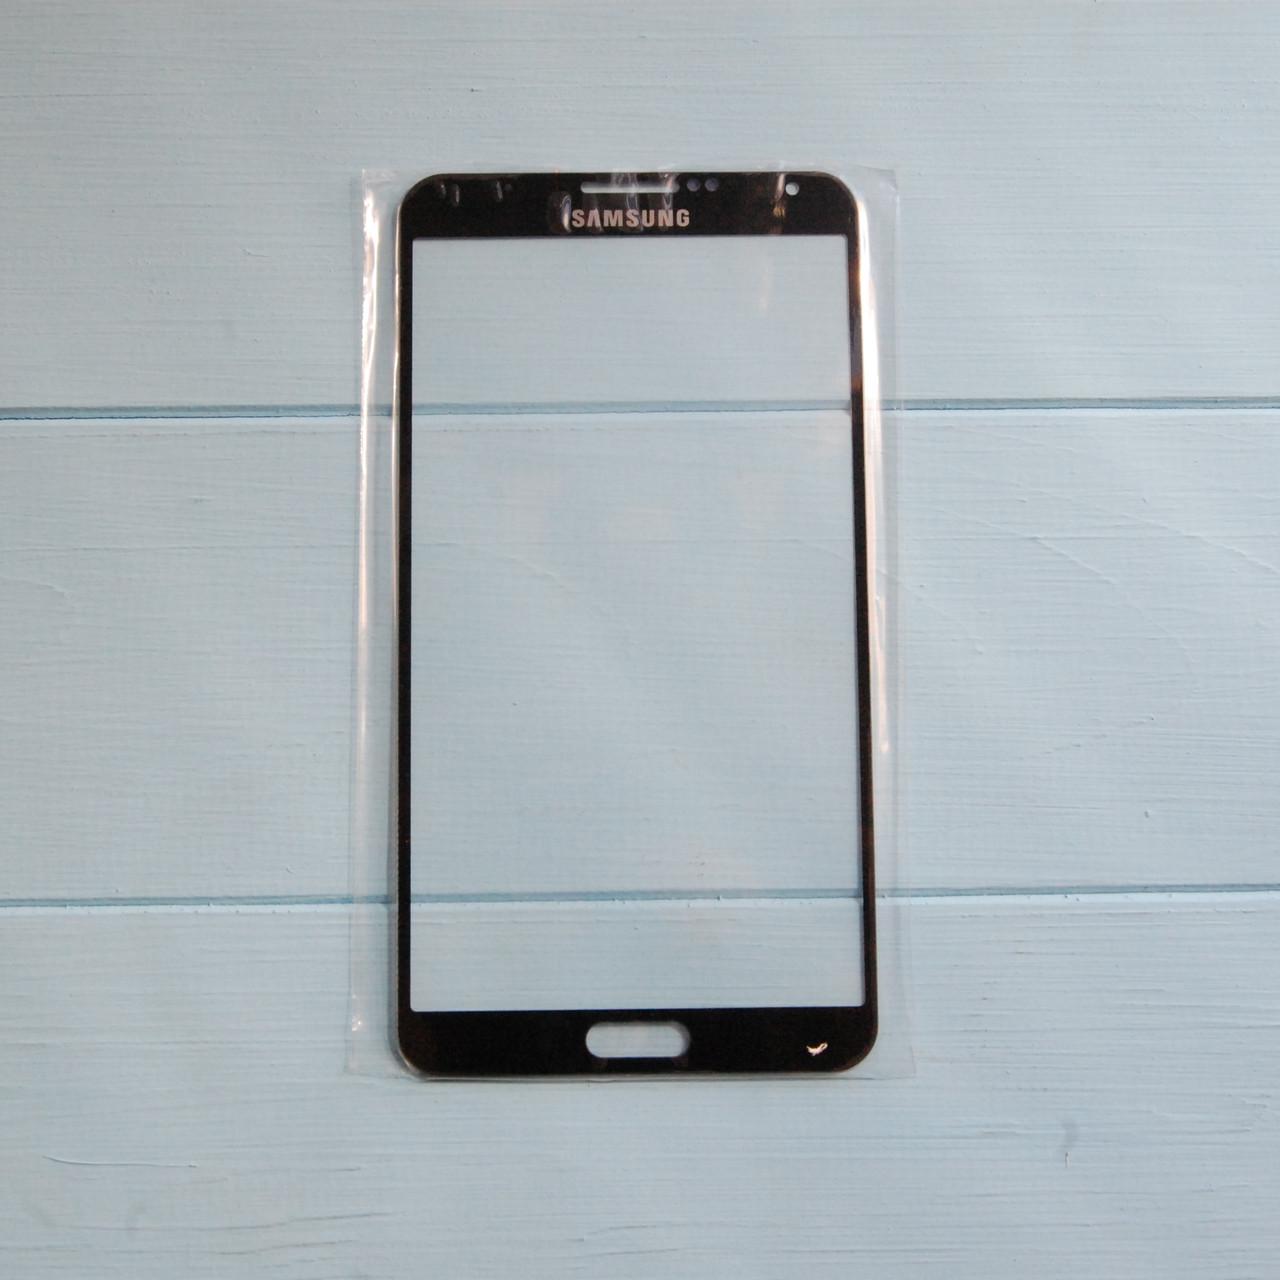 Стекло корпуса для Samsung N900 Note 3, N9000 Note 3, N9005 Note 3, N9006 Note 3 Black